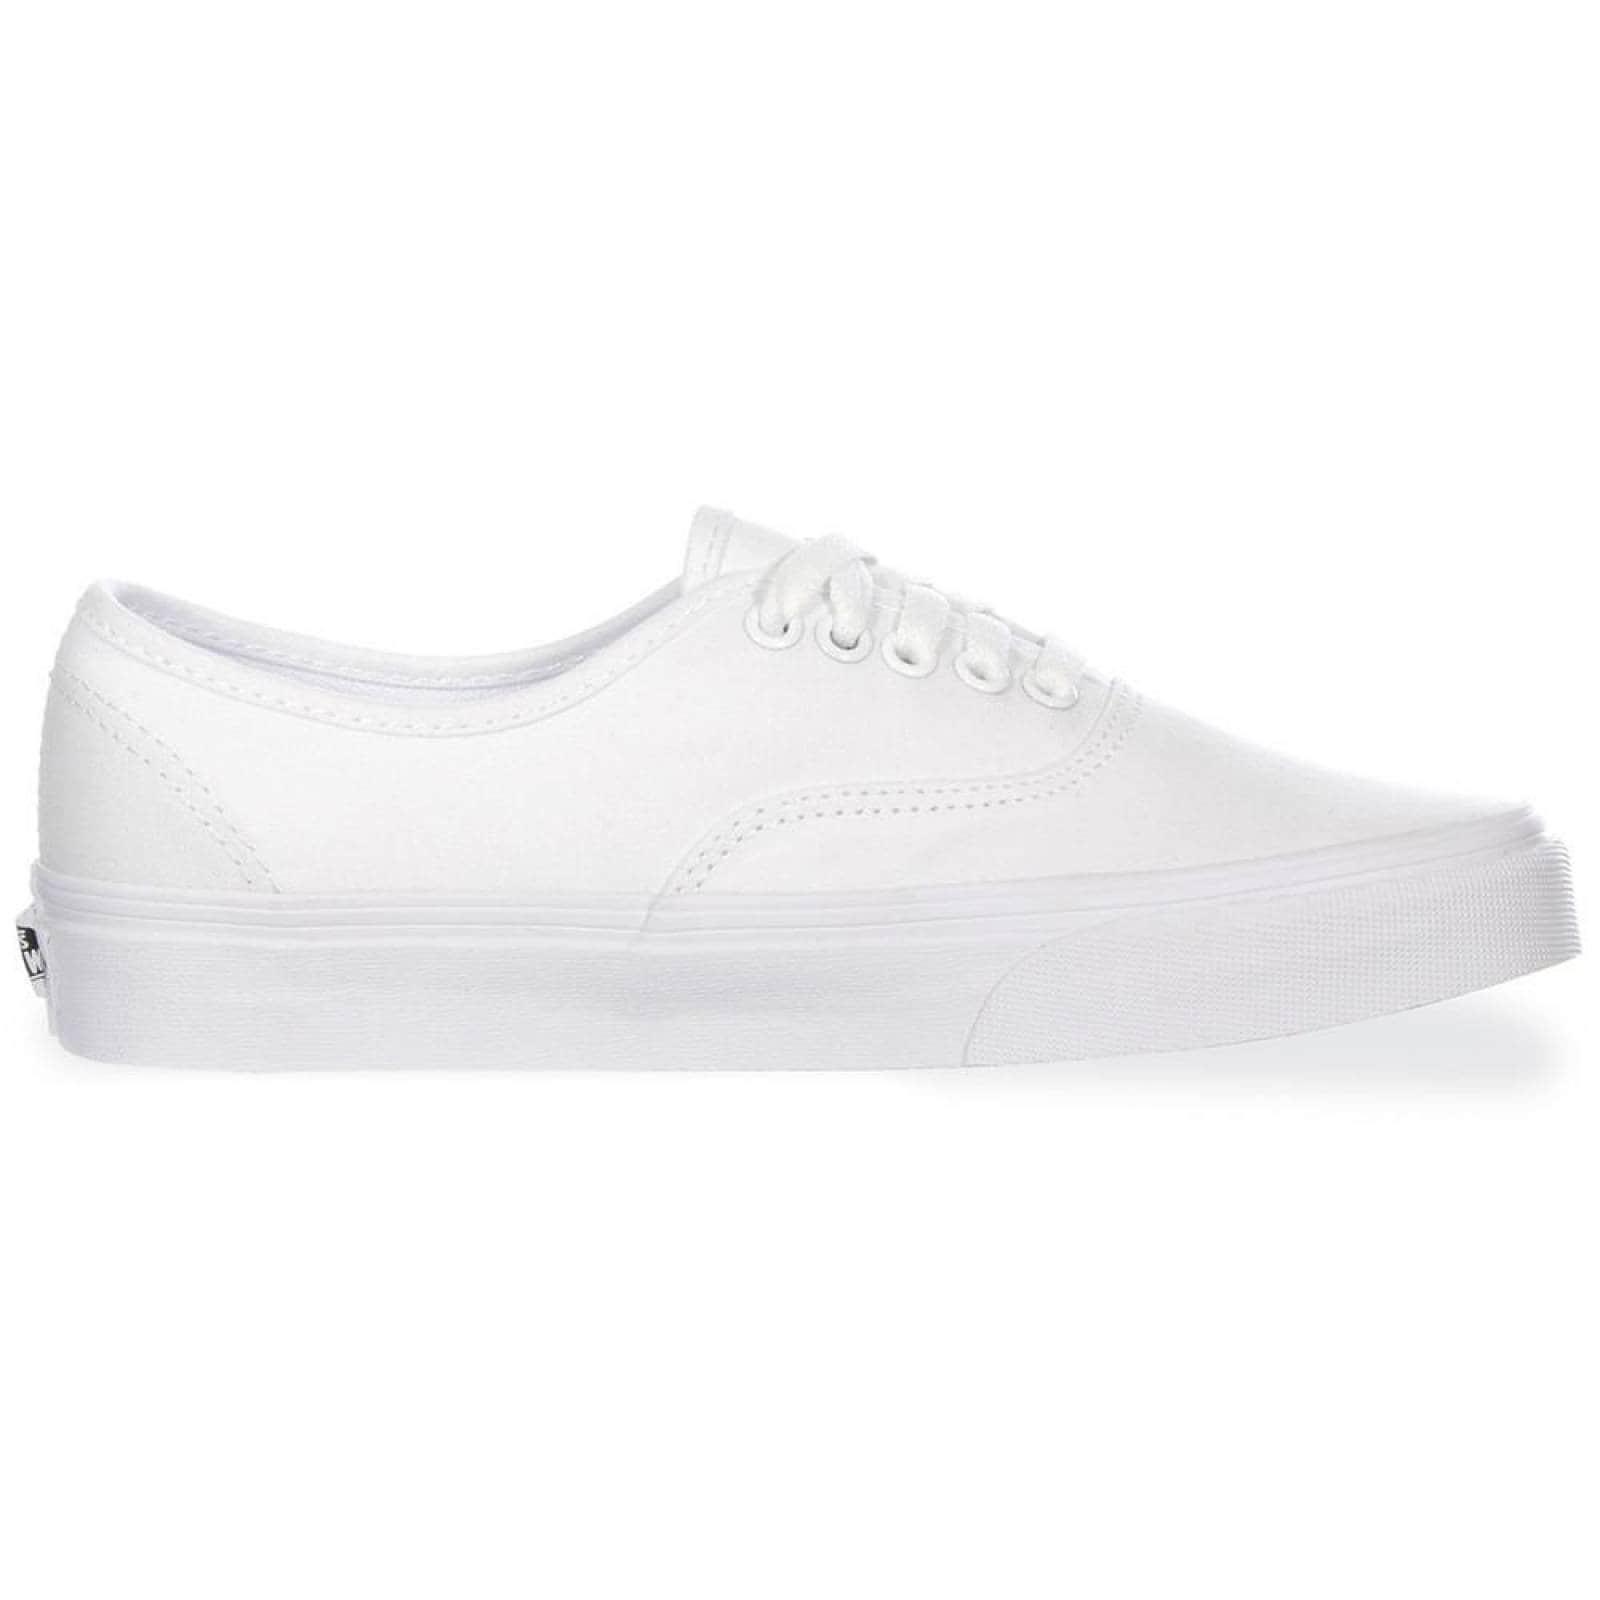 Tenis Vans Authentic - 0EE3W00 - Blanco - Unisex